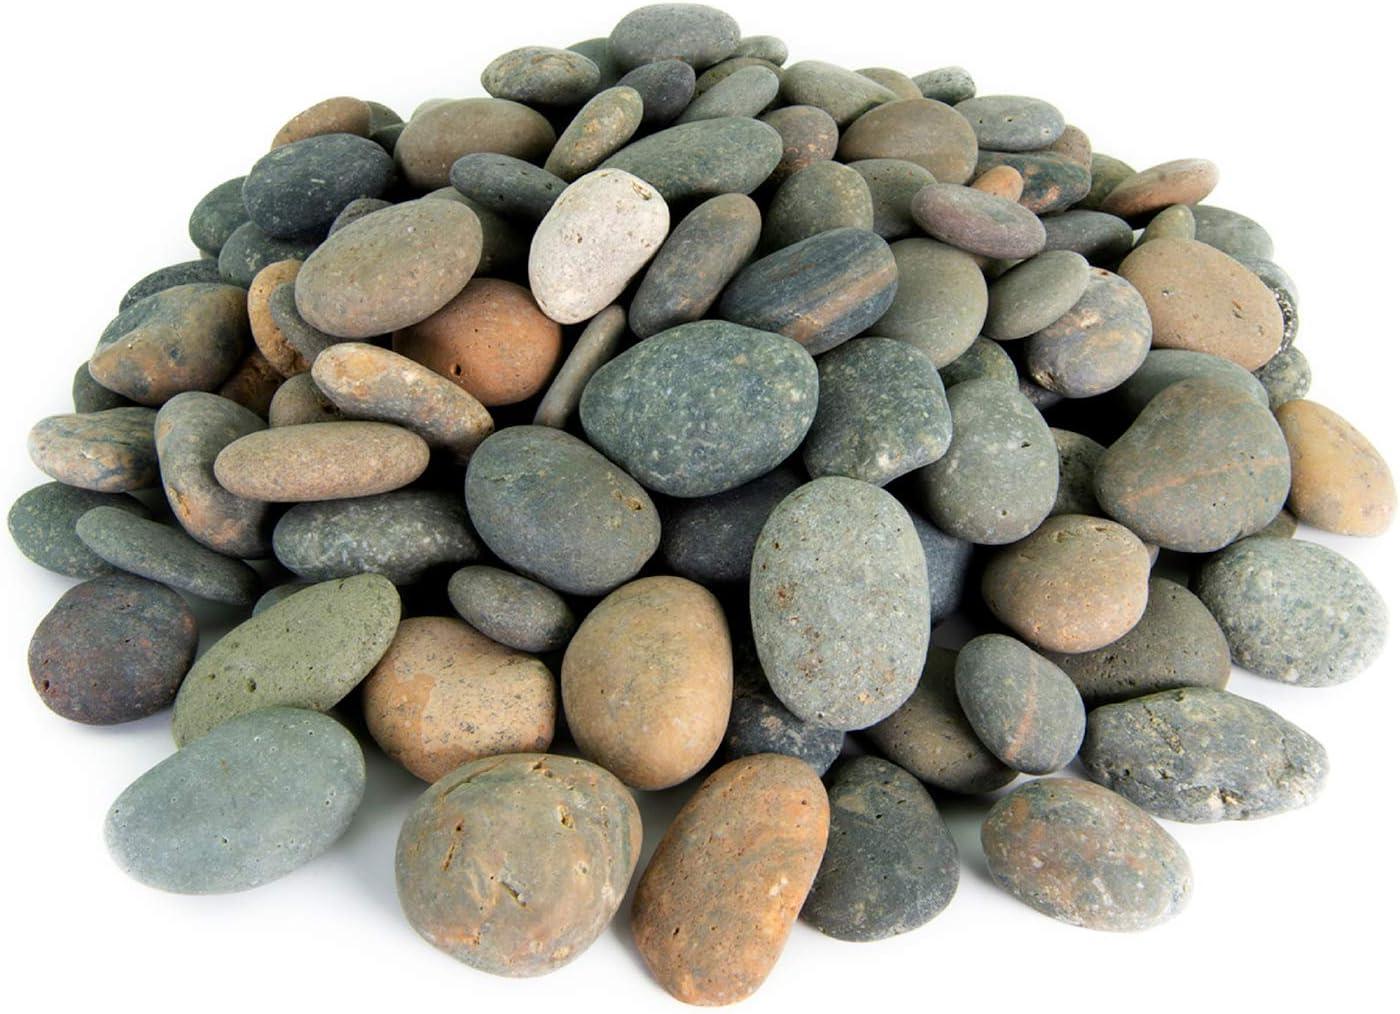 Bag River Stone Garden Pond Rocks Pebble FREE SHIPPING 2 Lb